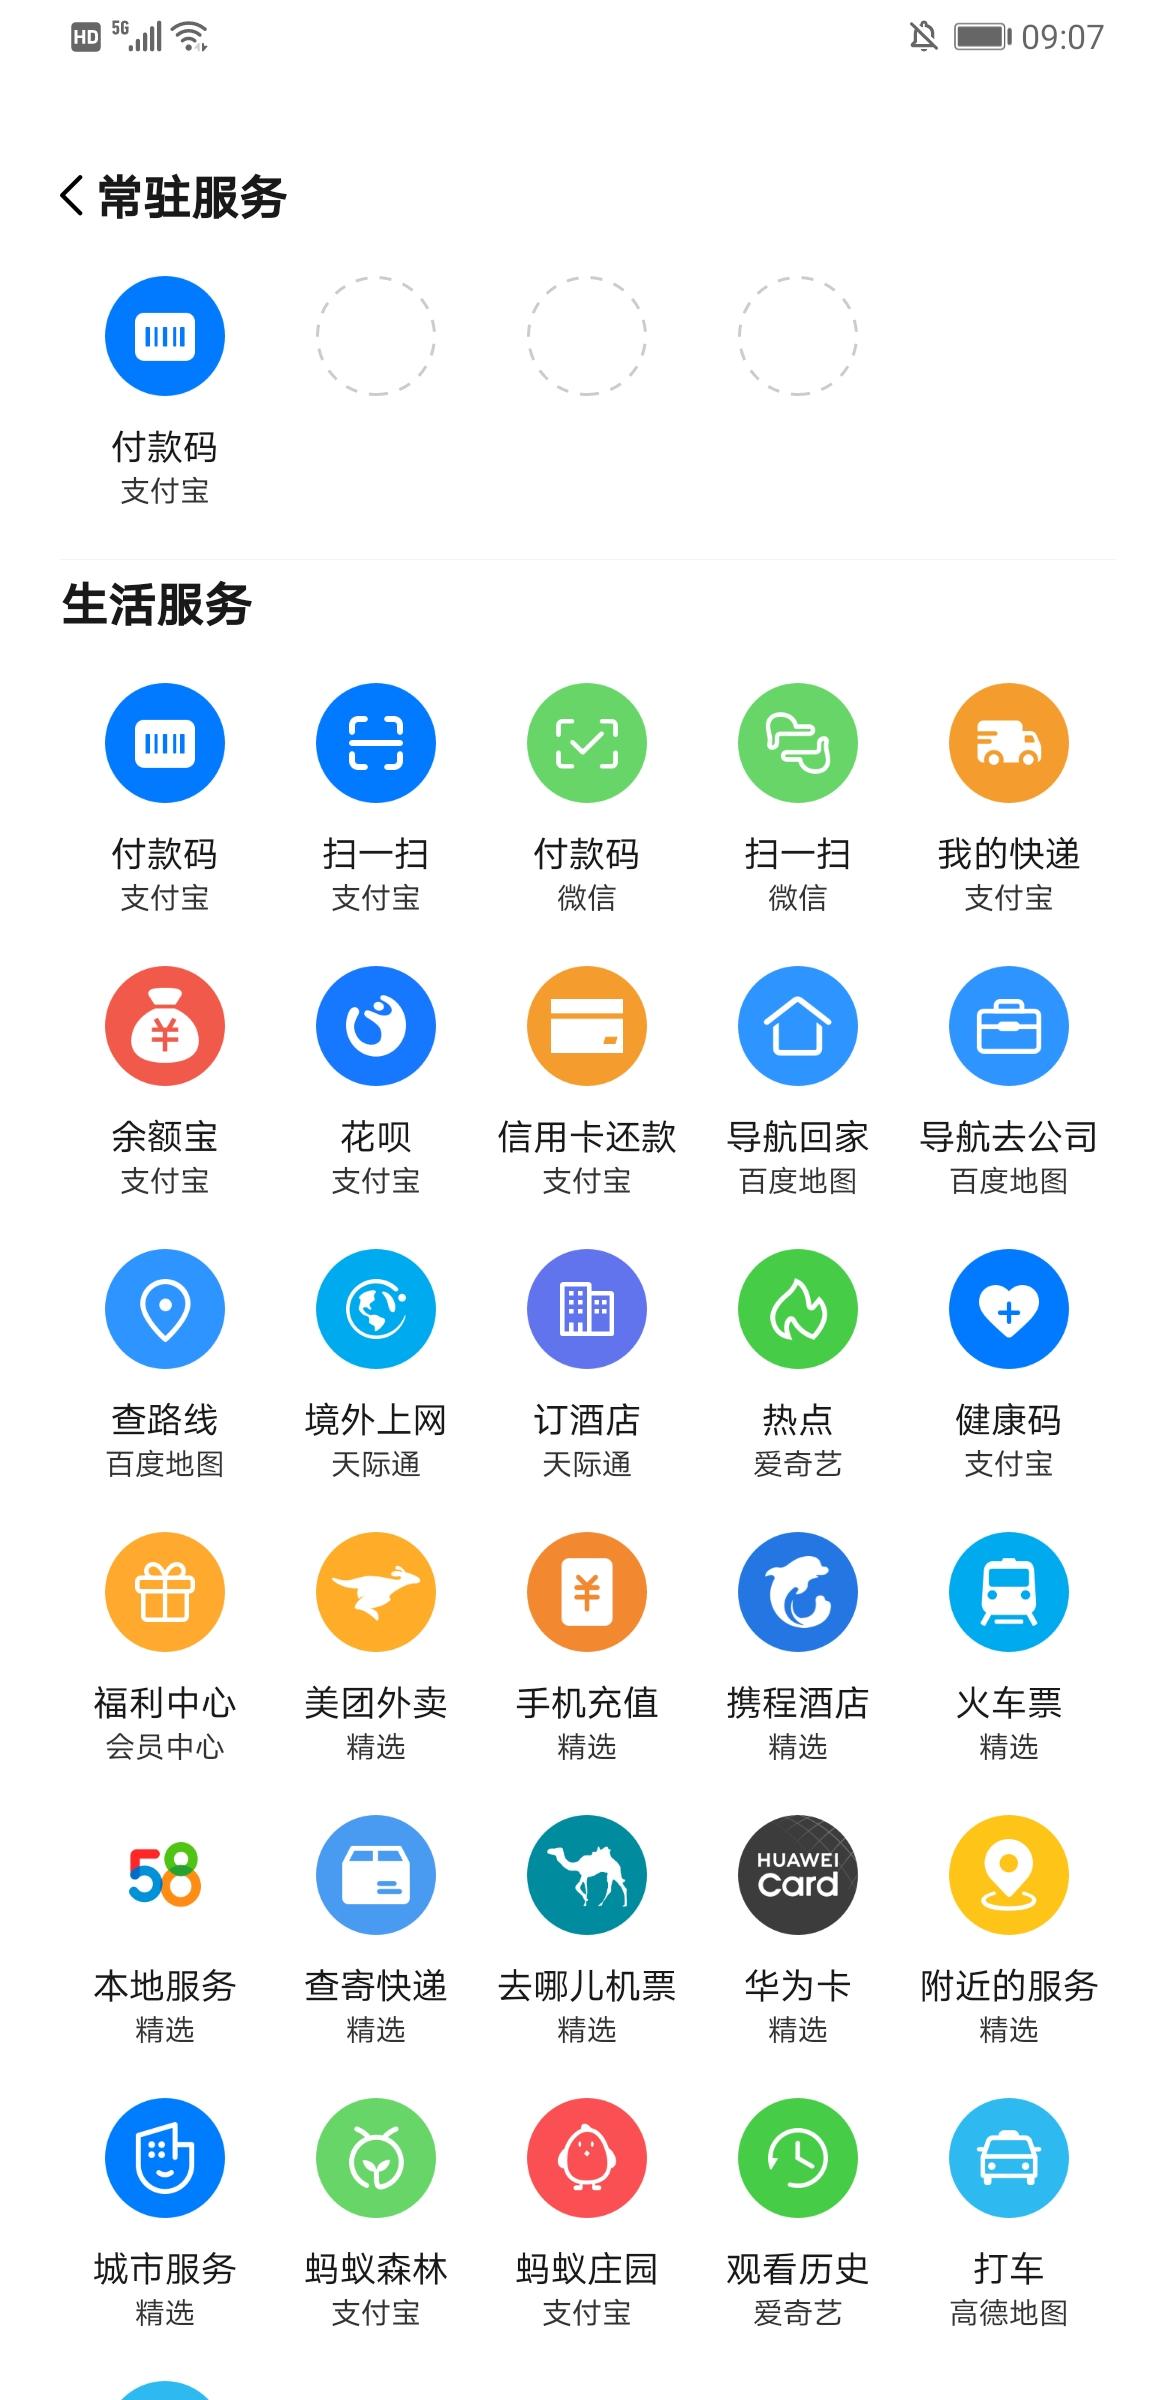 Screenshot_20201106_090738_com.huawei.intelligent.jpg